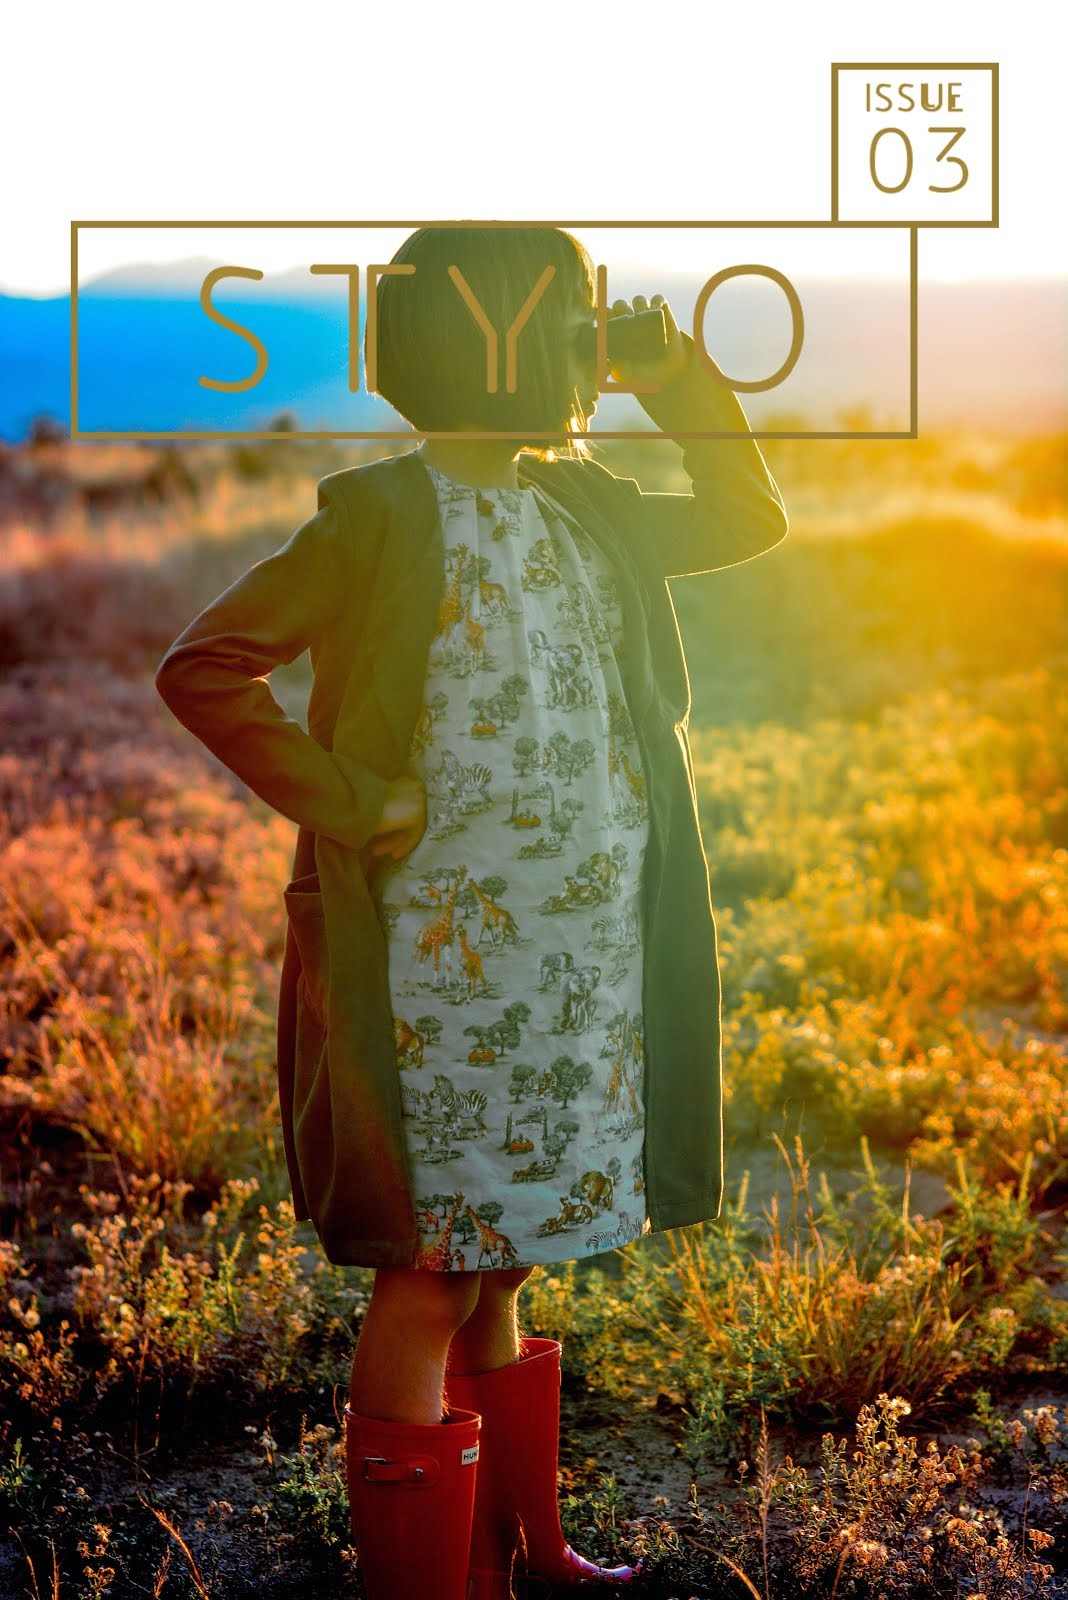 Stylo Magazine 03